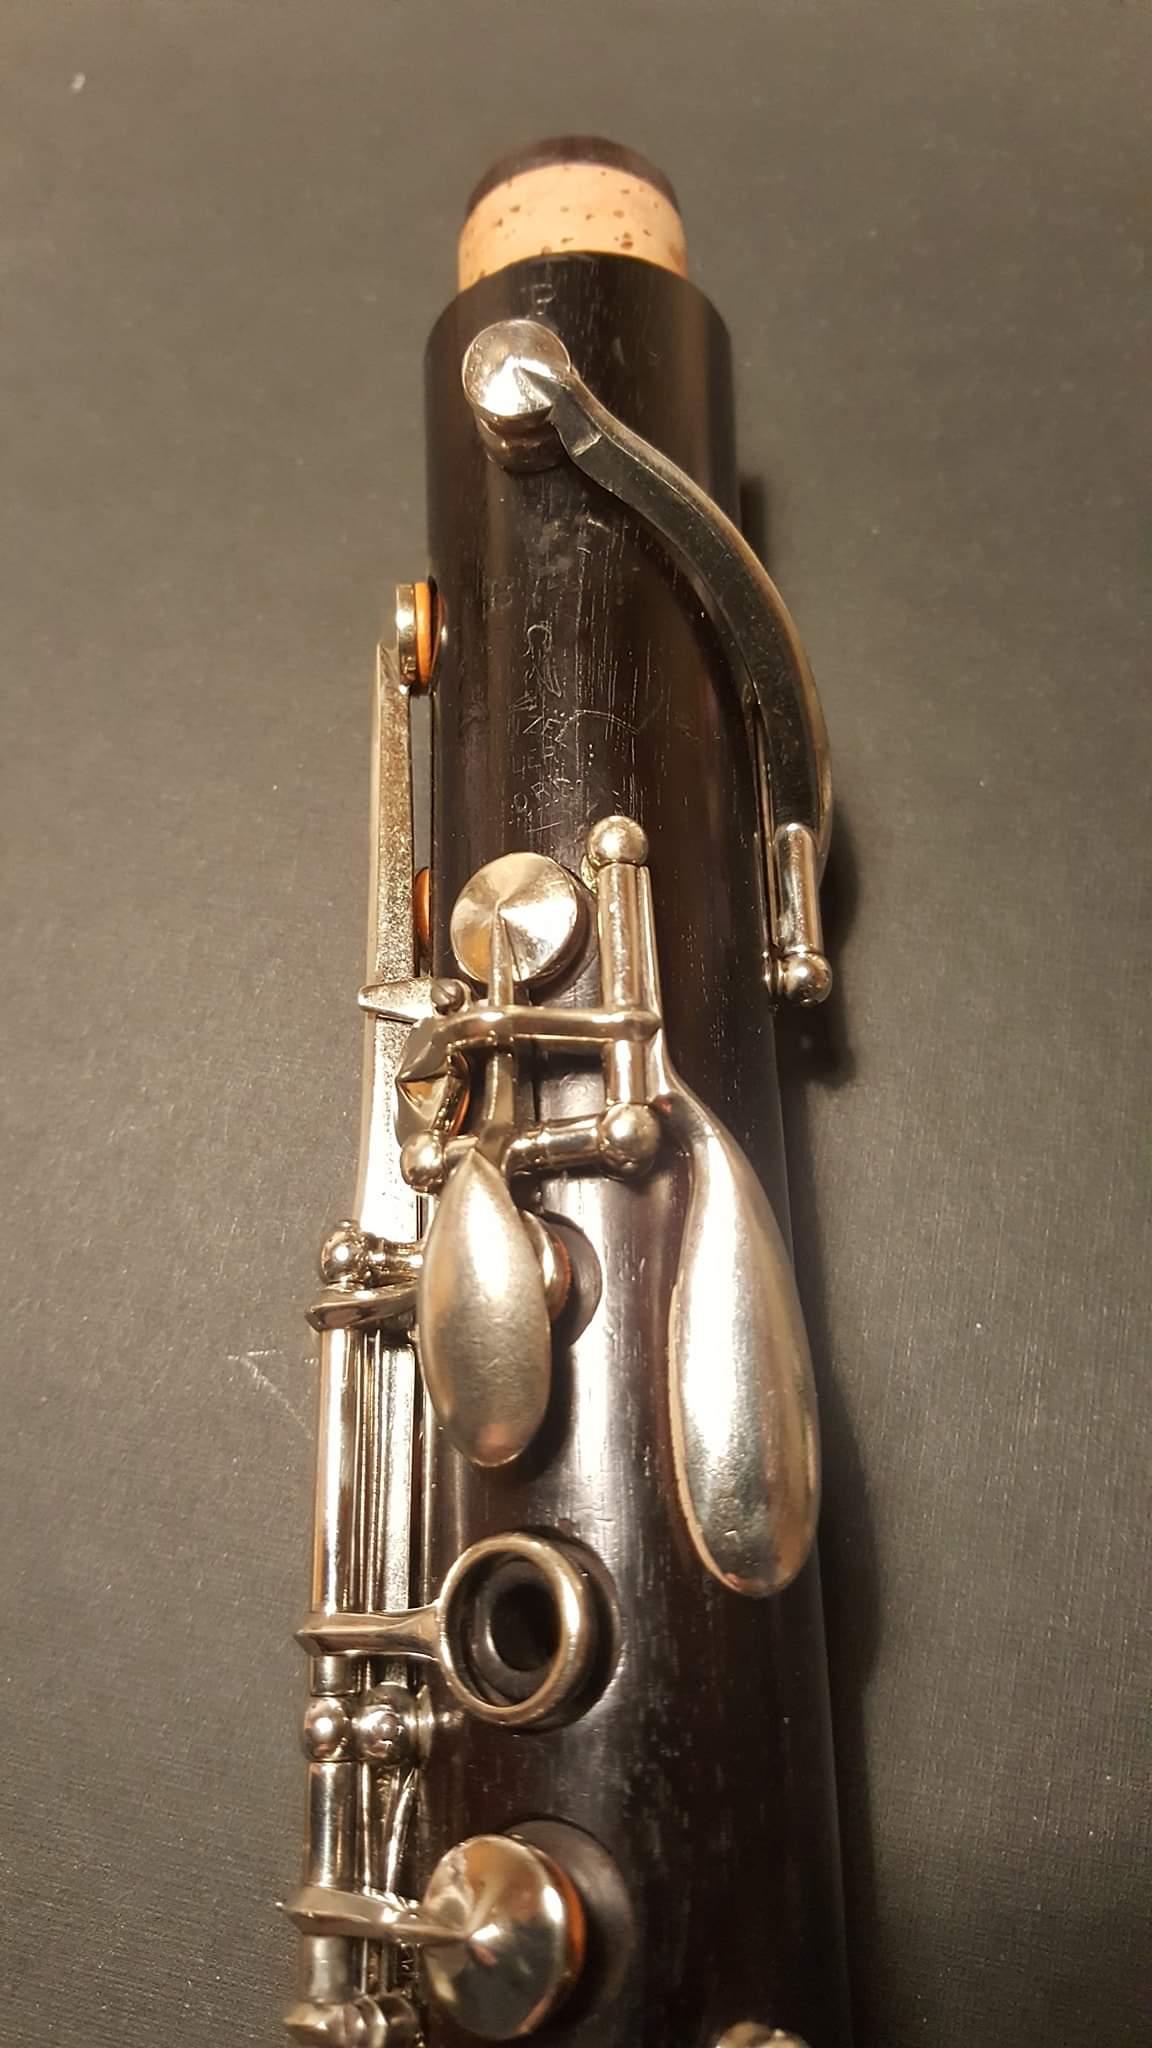 Penzel Mueller swan neck register key